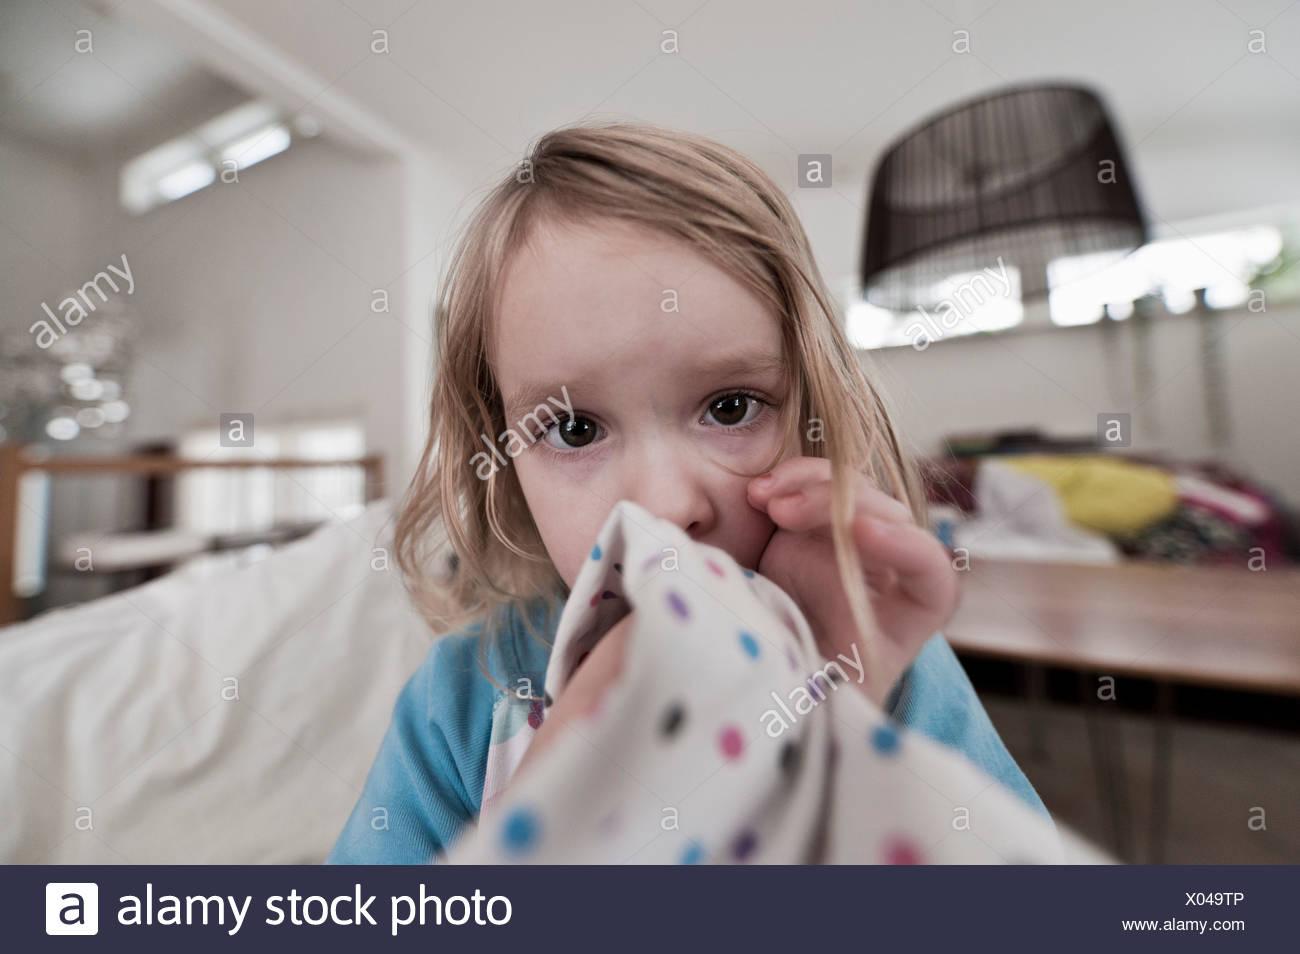 Portrait de bambin girl sucking thumb Photo Stock